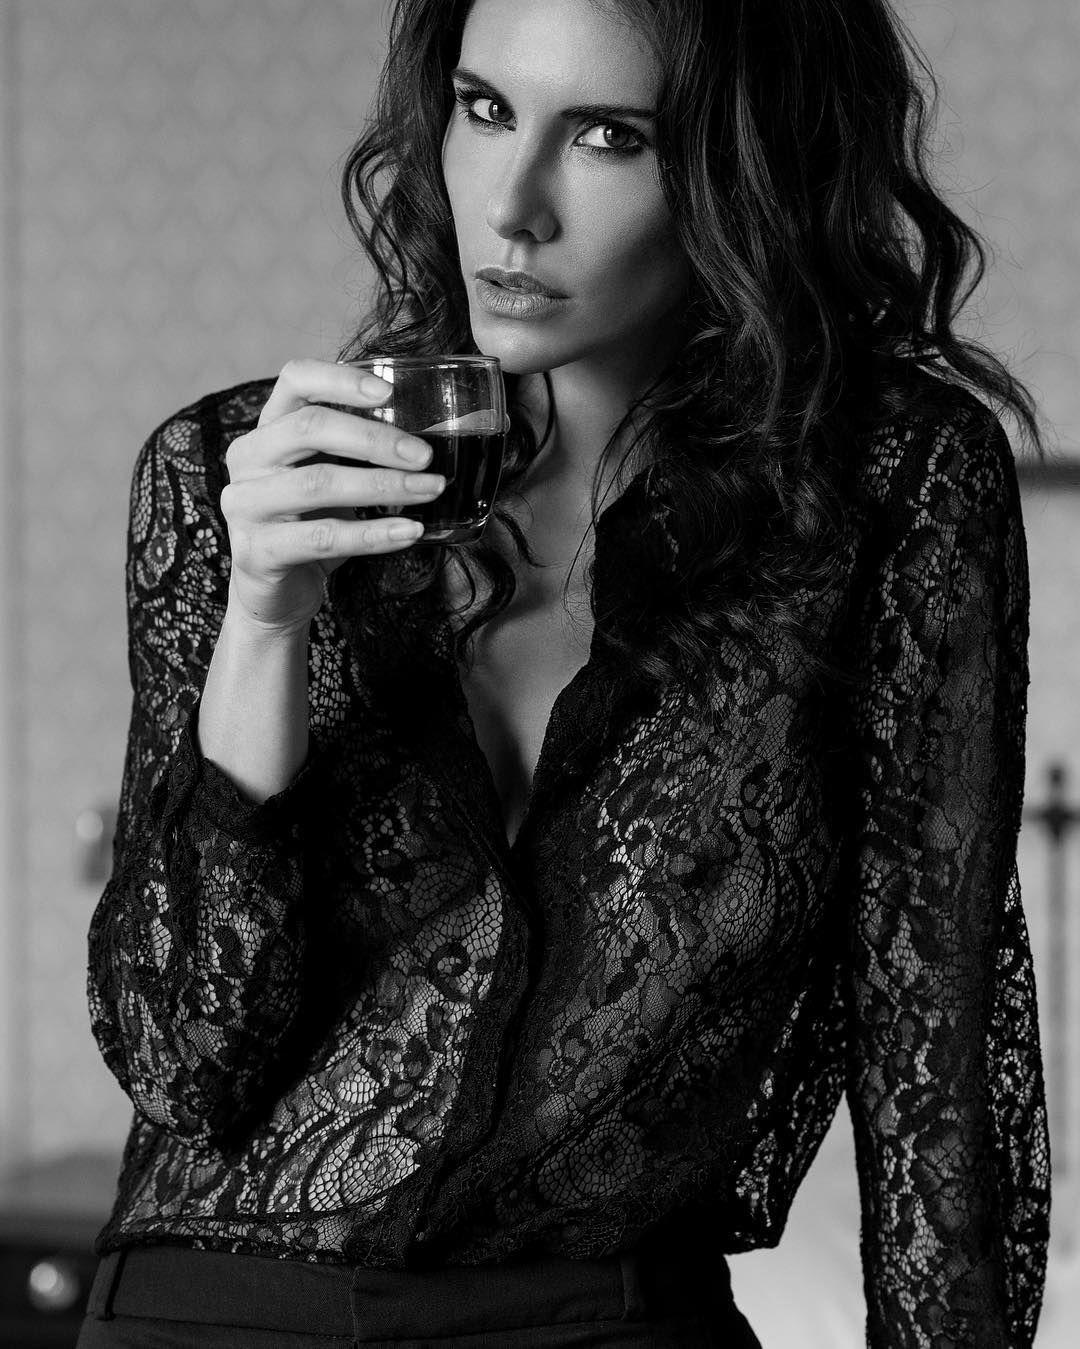 cameltoe Instagram Andja Lorein naked photo 2017